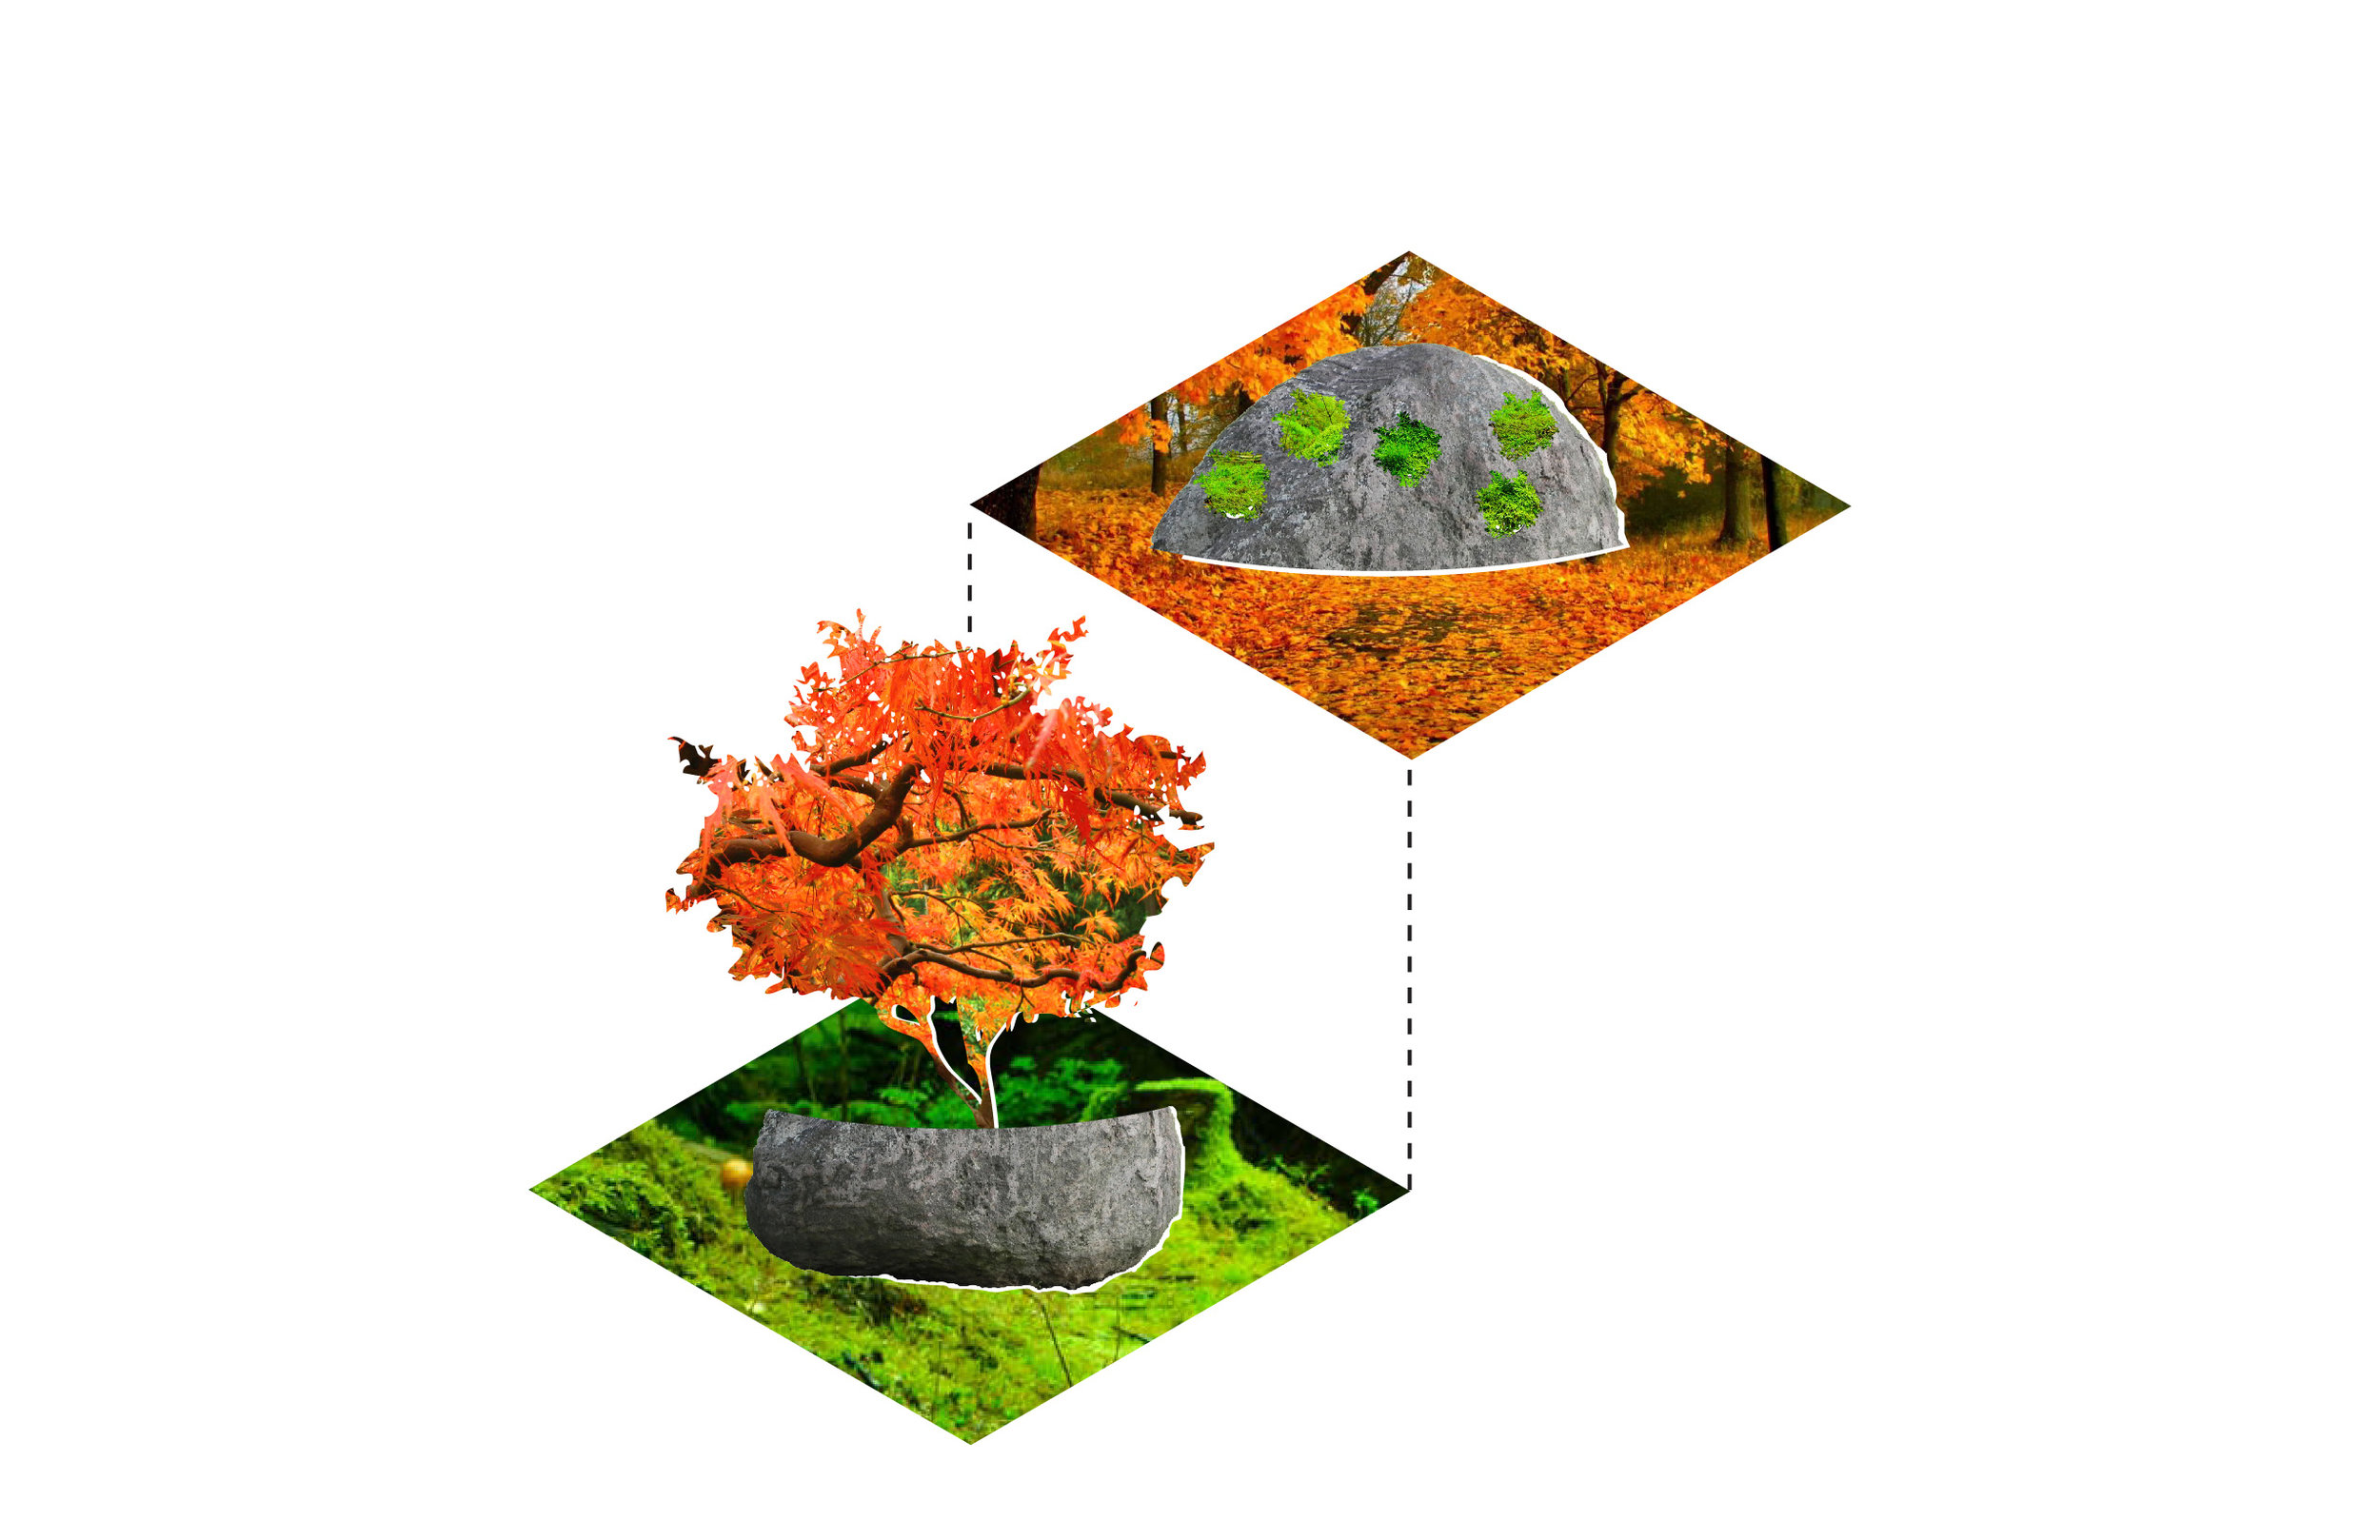 WIP_Pier-70_(2)-boulder_spring-fall_up-down-01.jpg